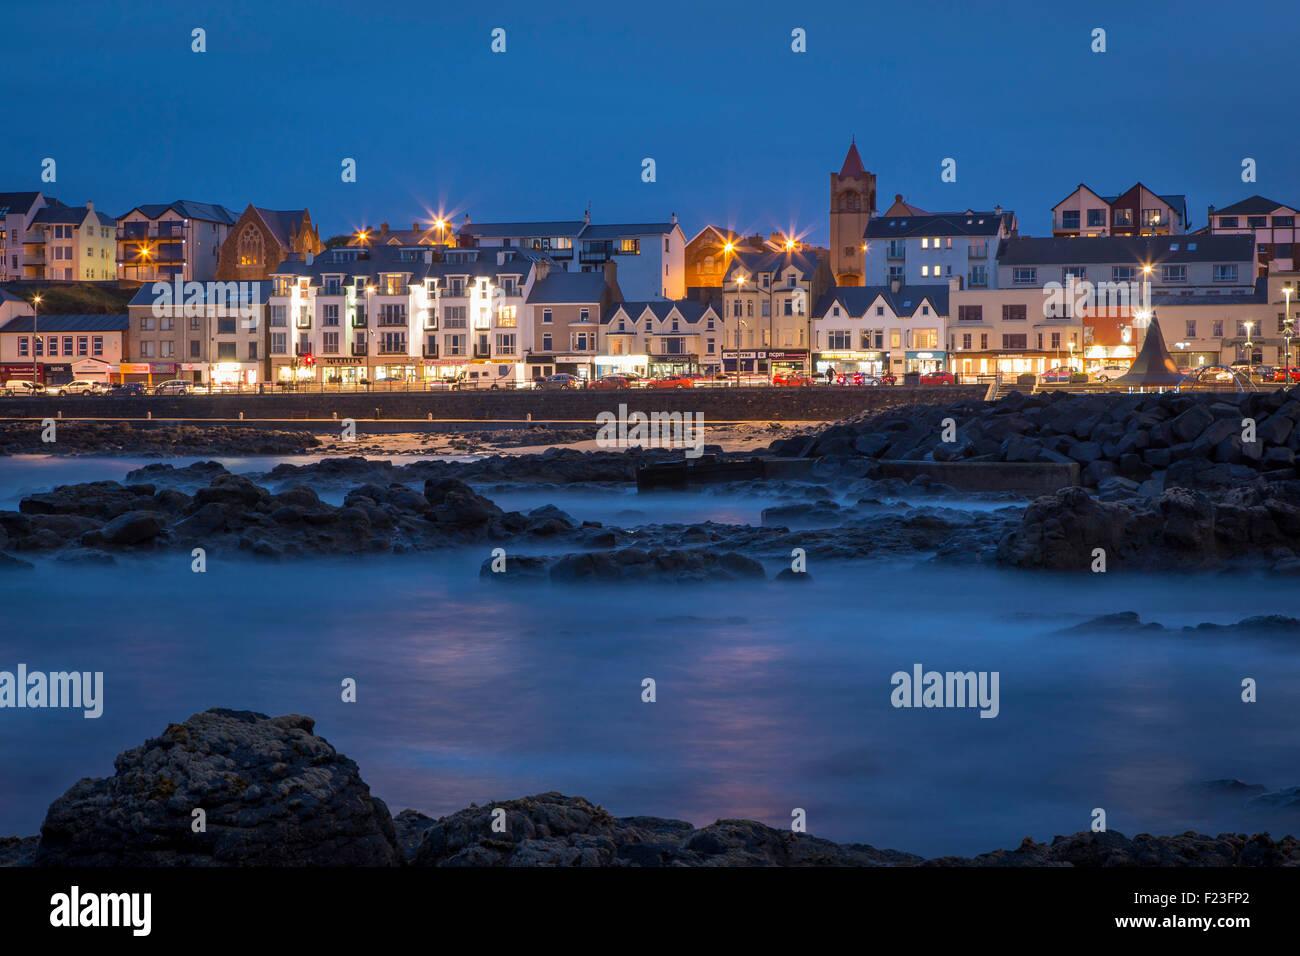 Twilight over Portstewart, County Antrim, Northern Ireland, UK - Stock Image